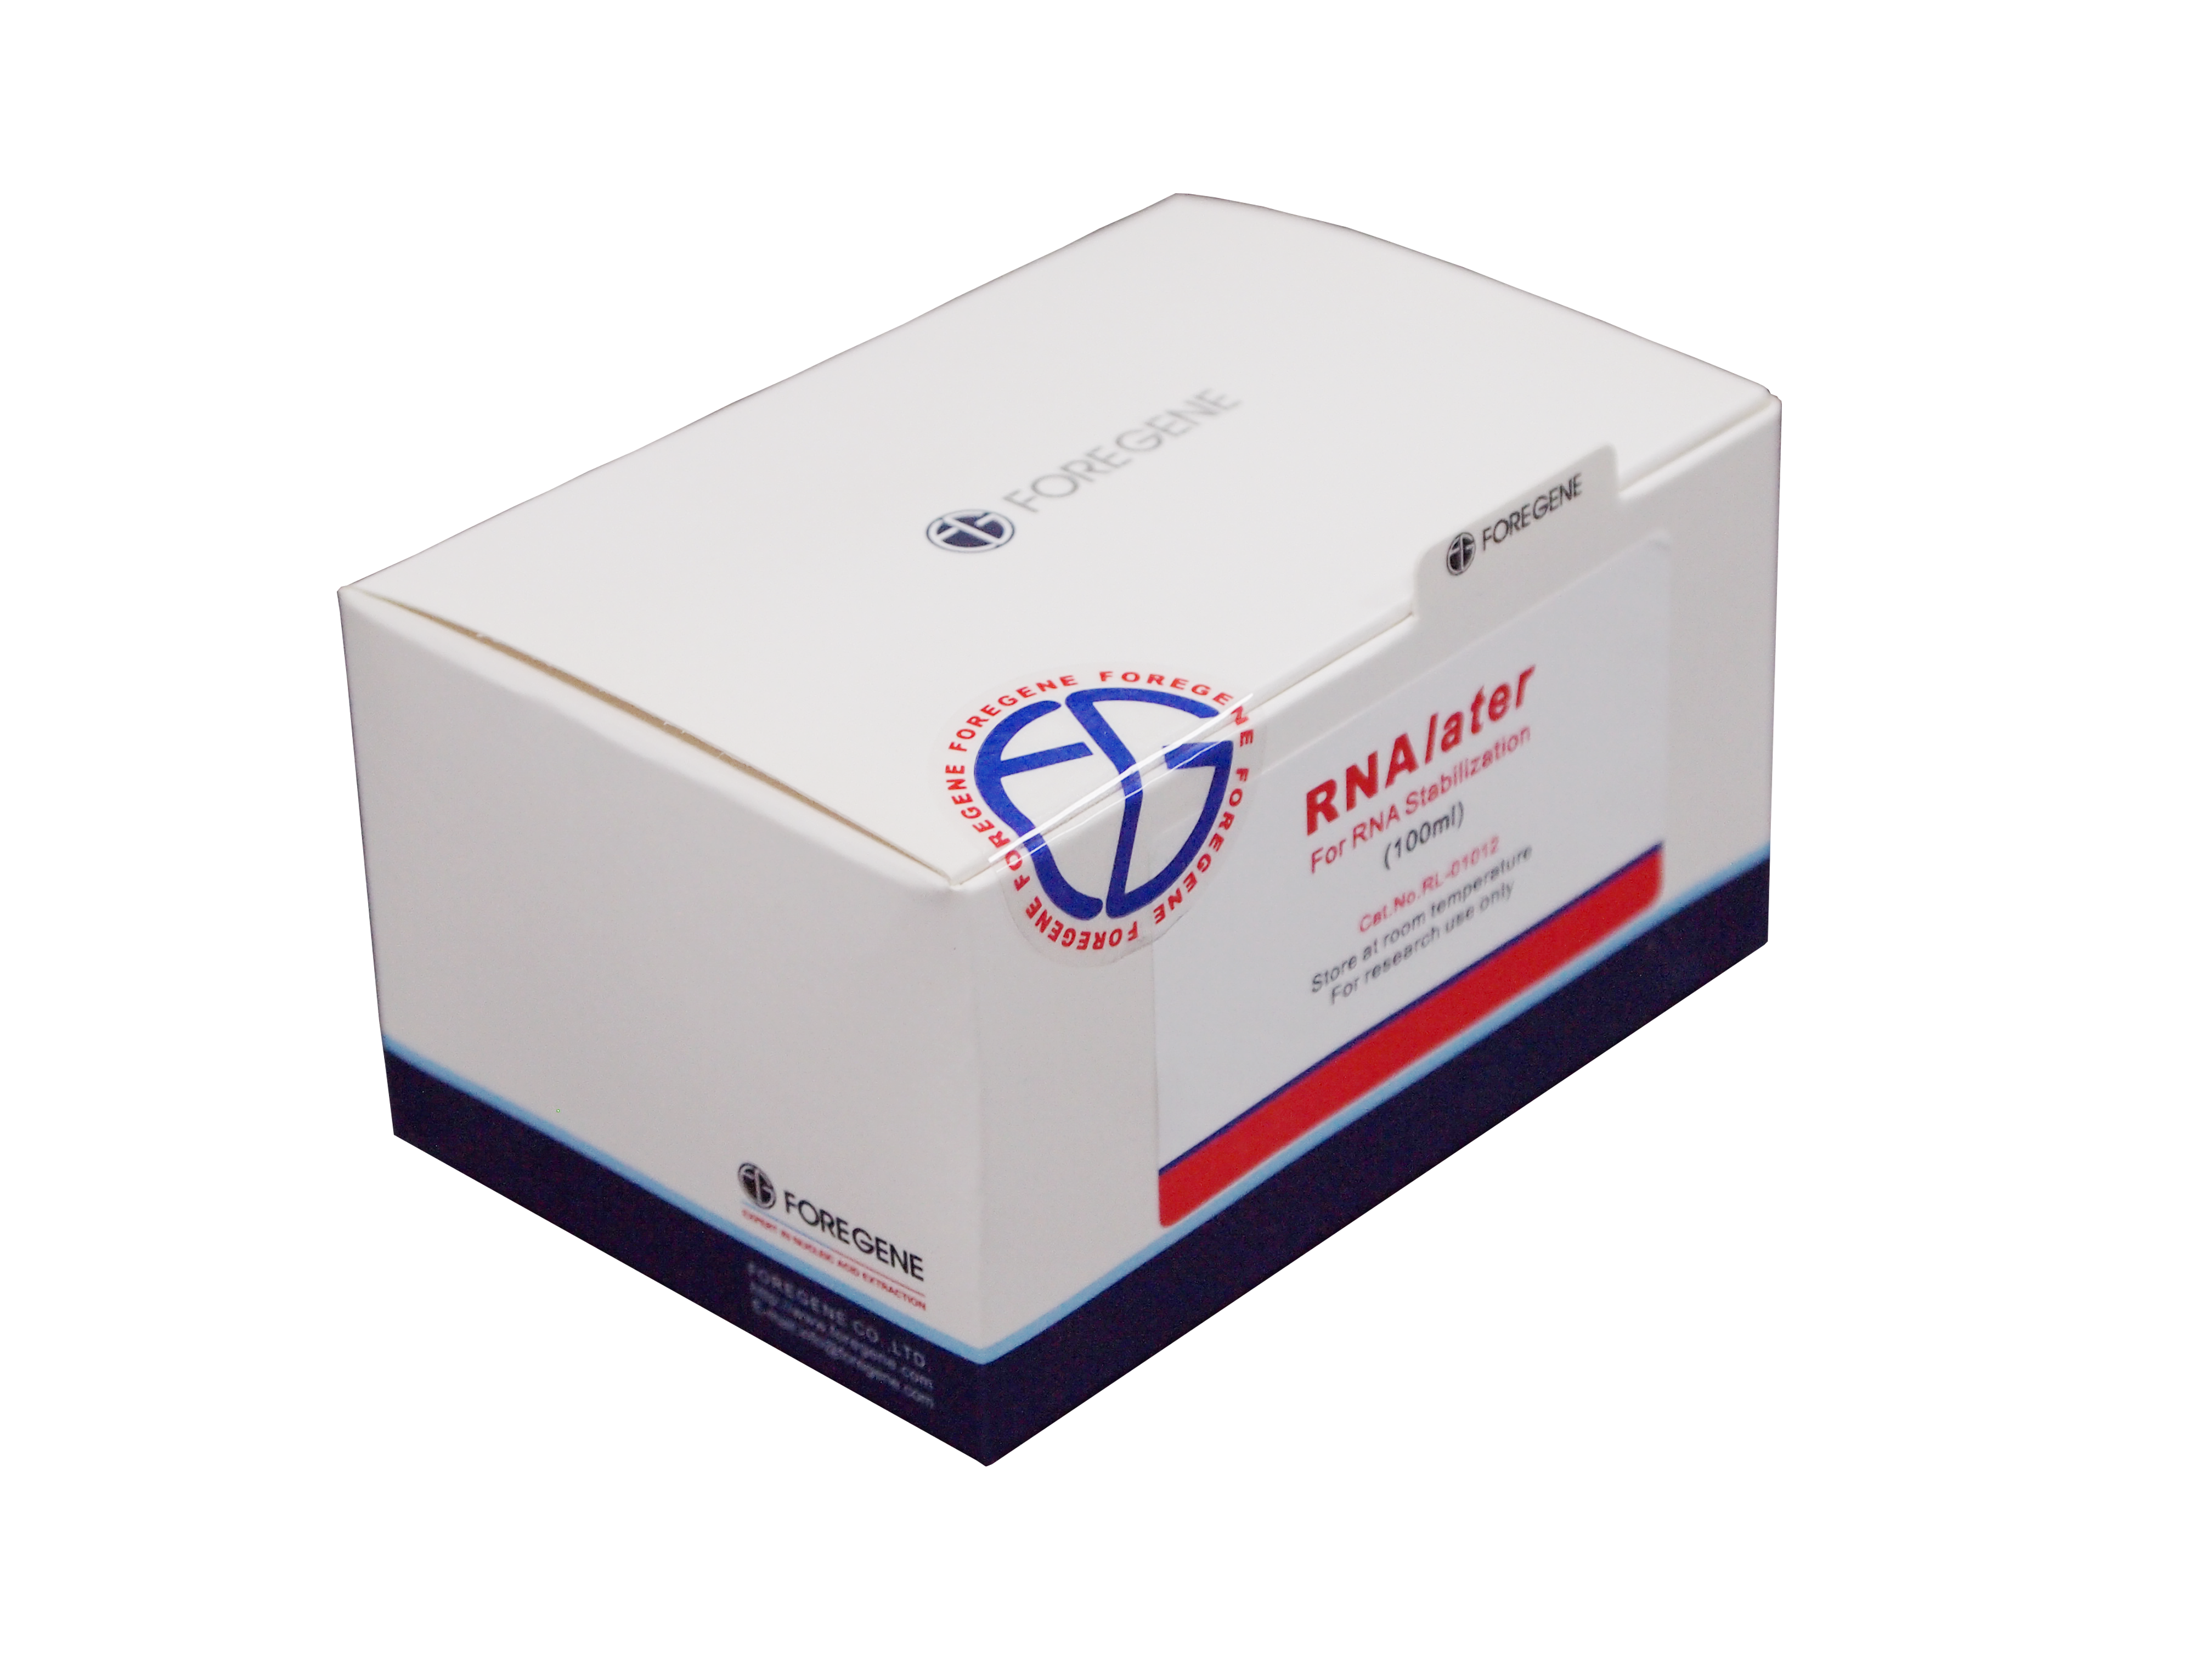 动物组织RNA保存液RNAlater(For RNA Stabilization)